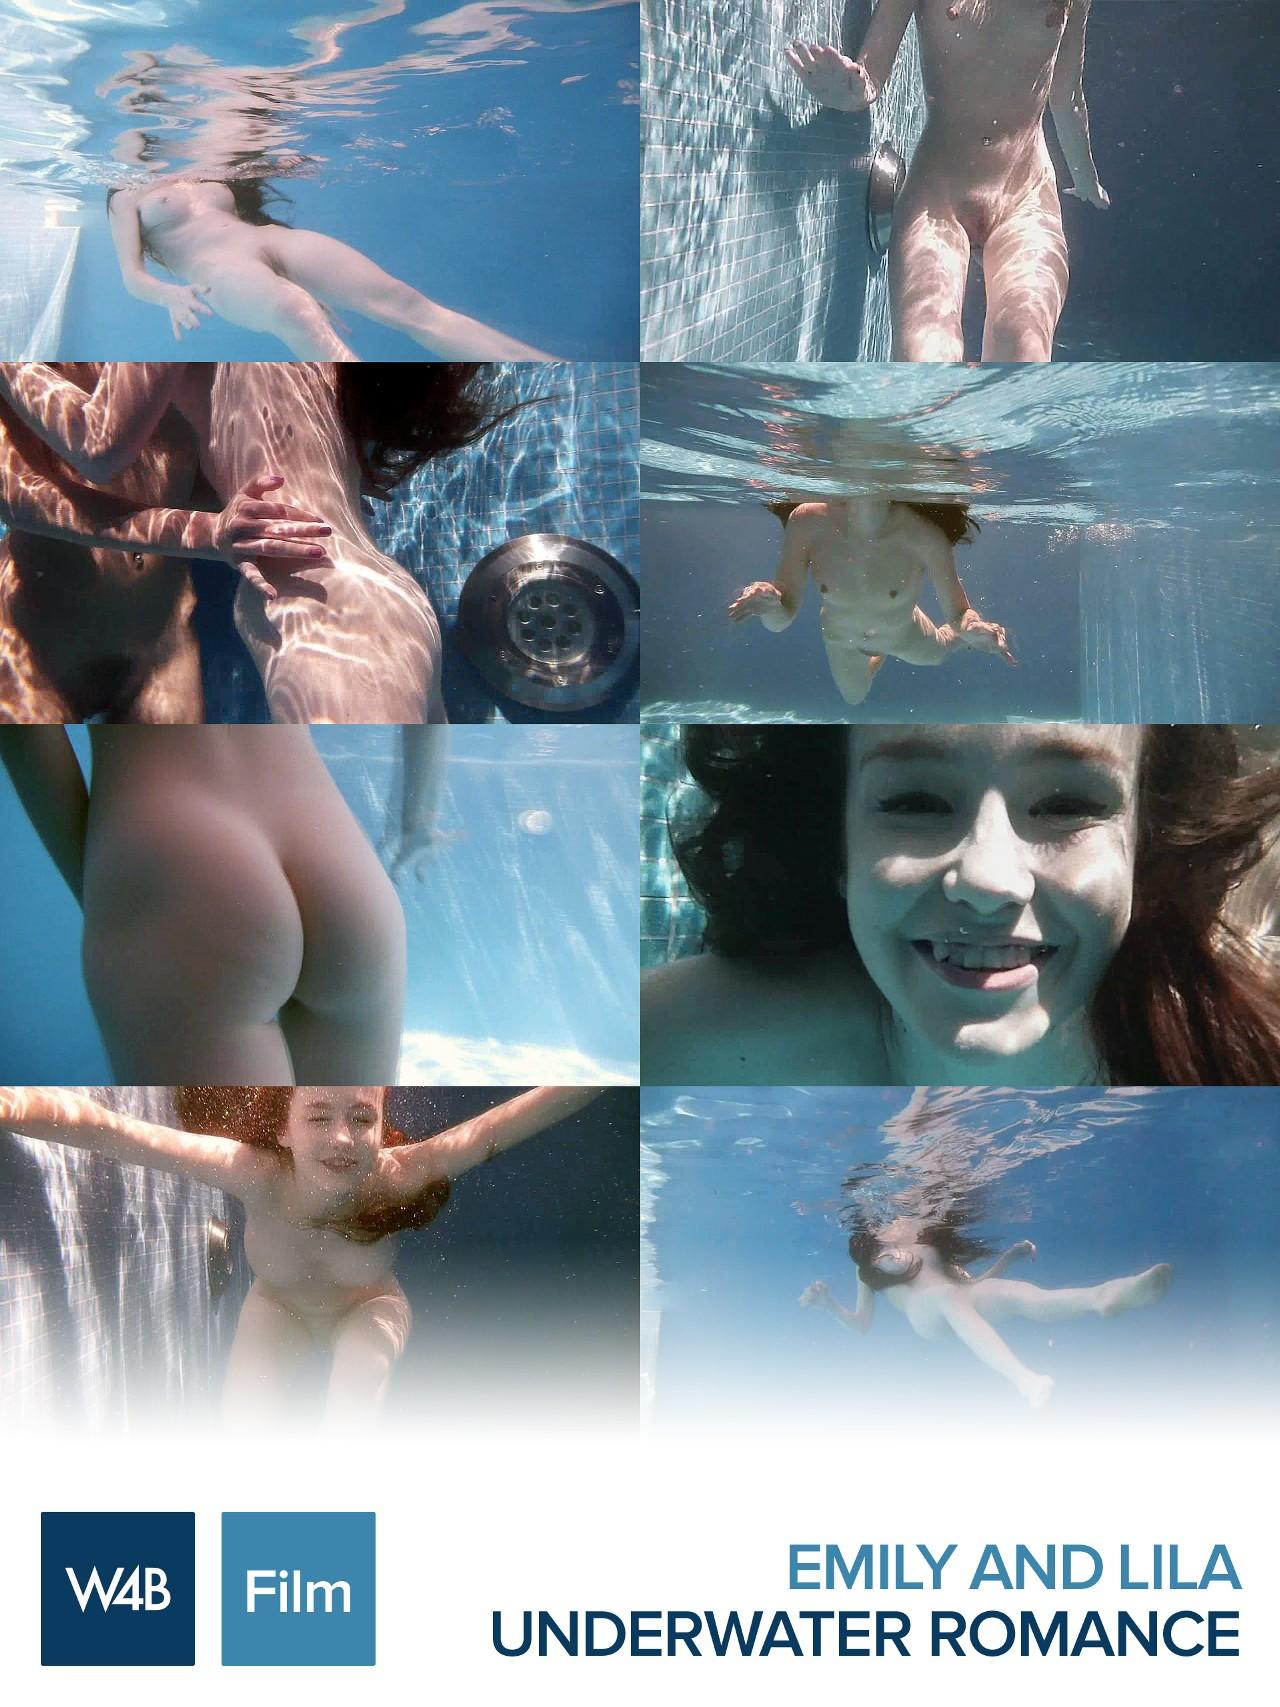 Emily, Lila: Underwater romance